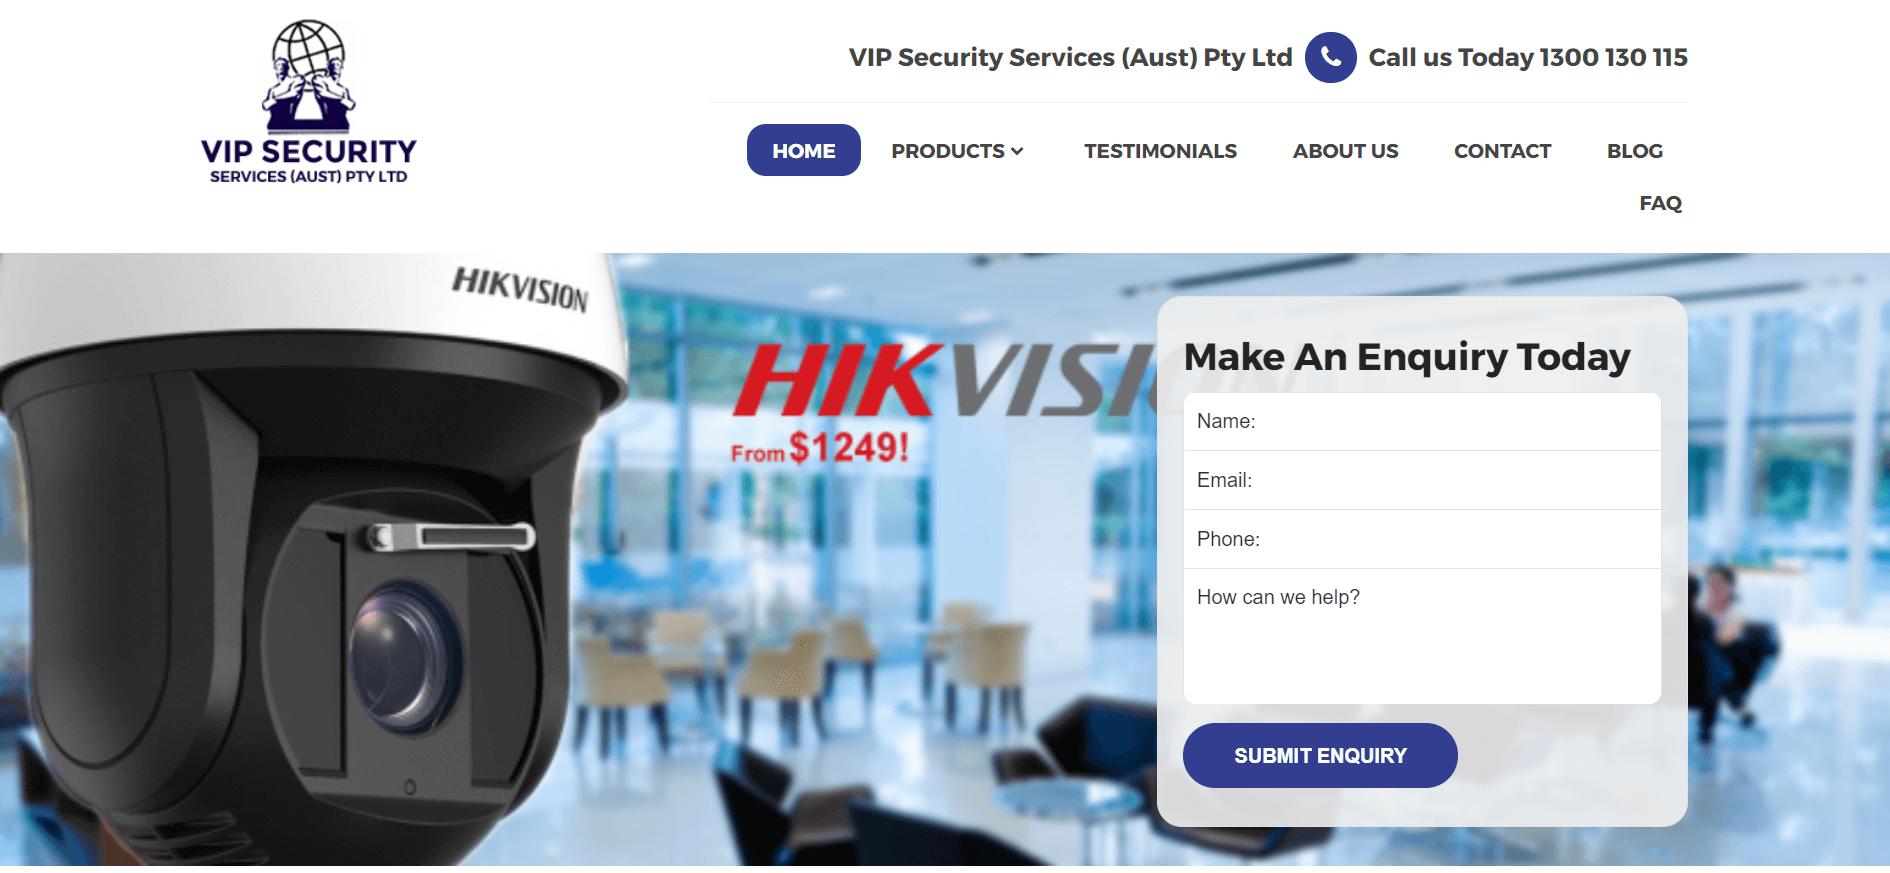 vip security